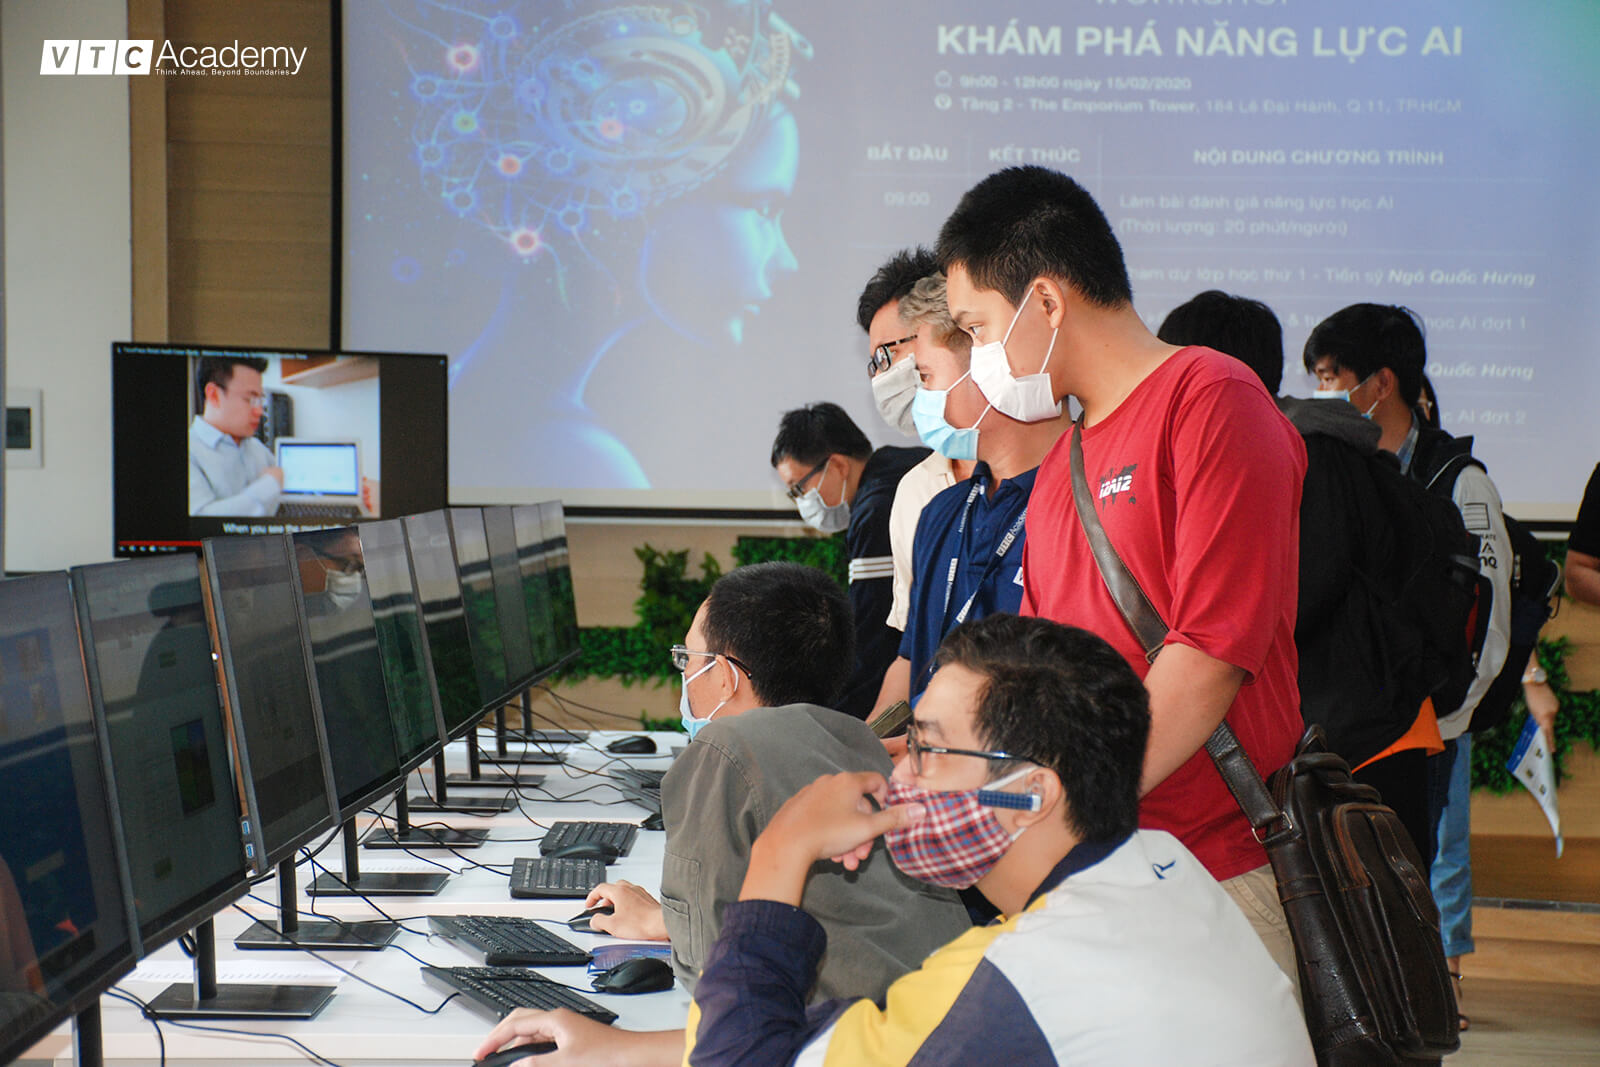 VTC Academy tổ chức workshop